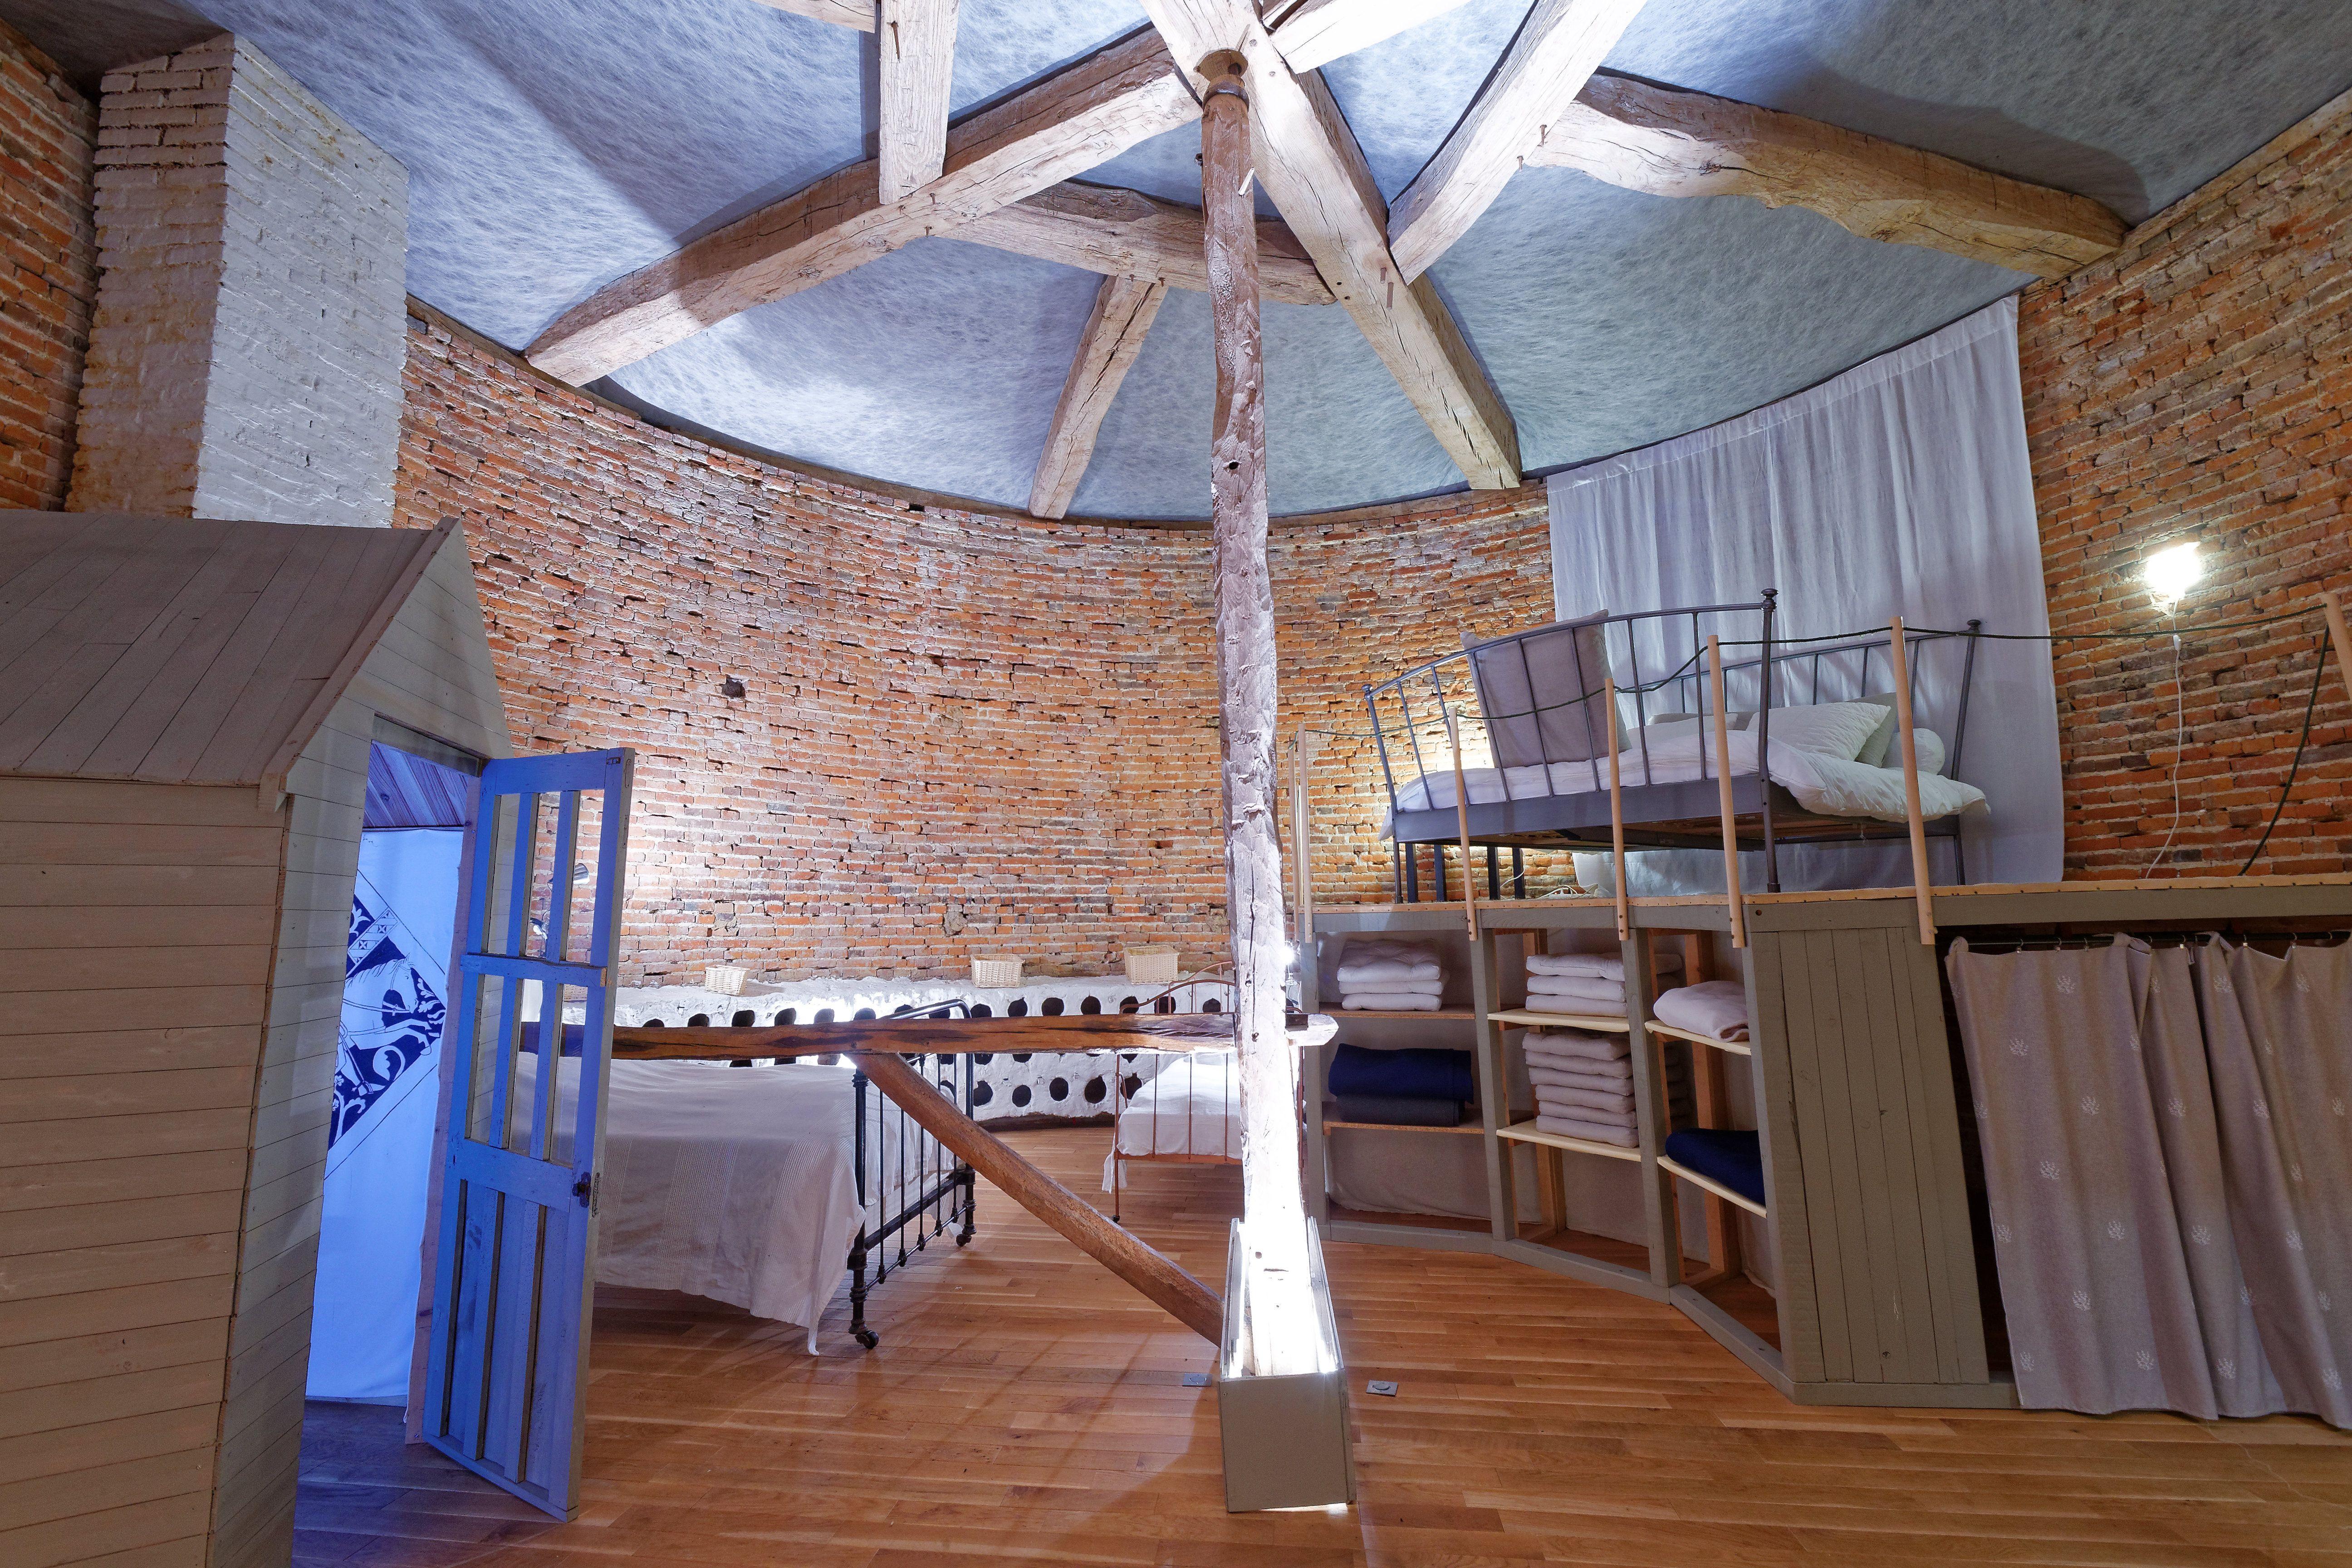 sauna beauvais interesting aquatic complex beauvais with sauna beauvais free cabane spa pella. Black Bedroom Furniture Sets. Home Design Ideas